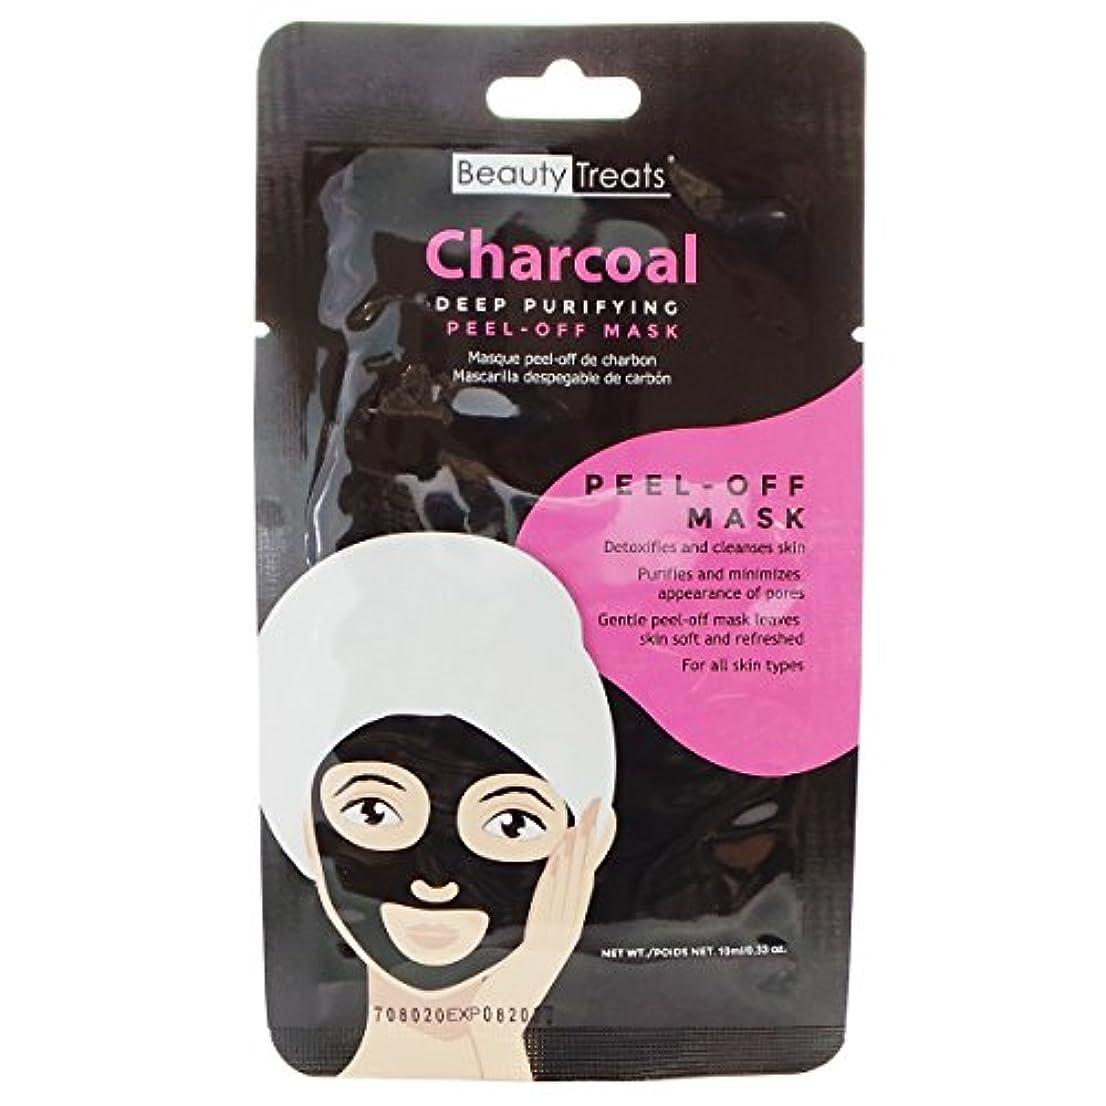 (6 Pack) BEAUTY TREATS Deep Purifying Peel-Off Charcoal Mask (並行輸入品)